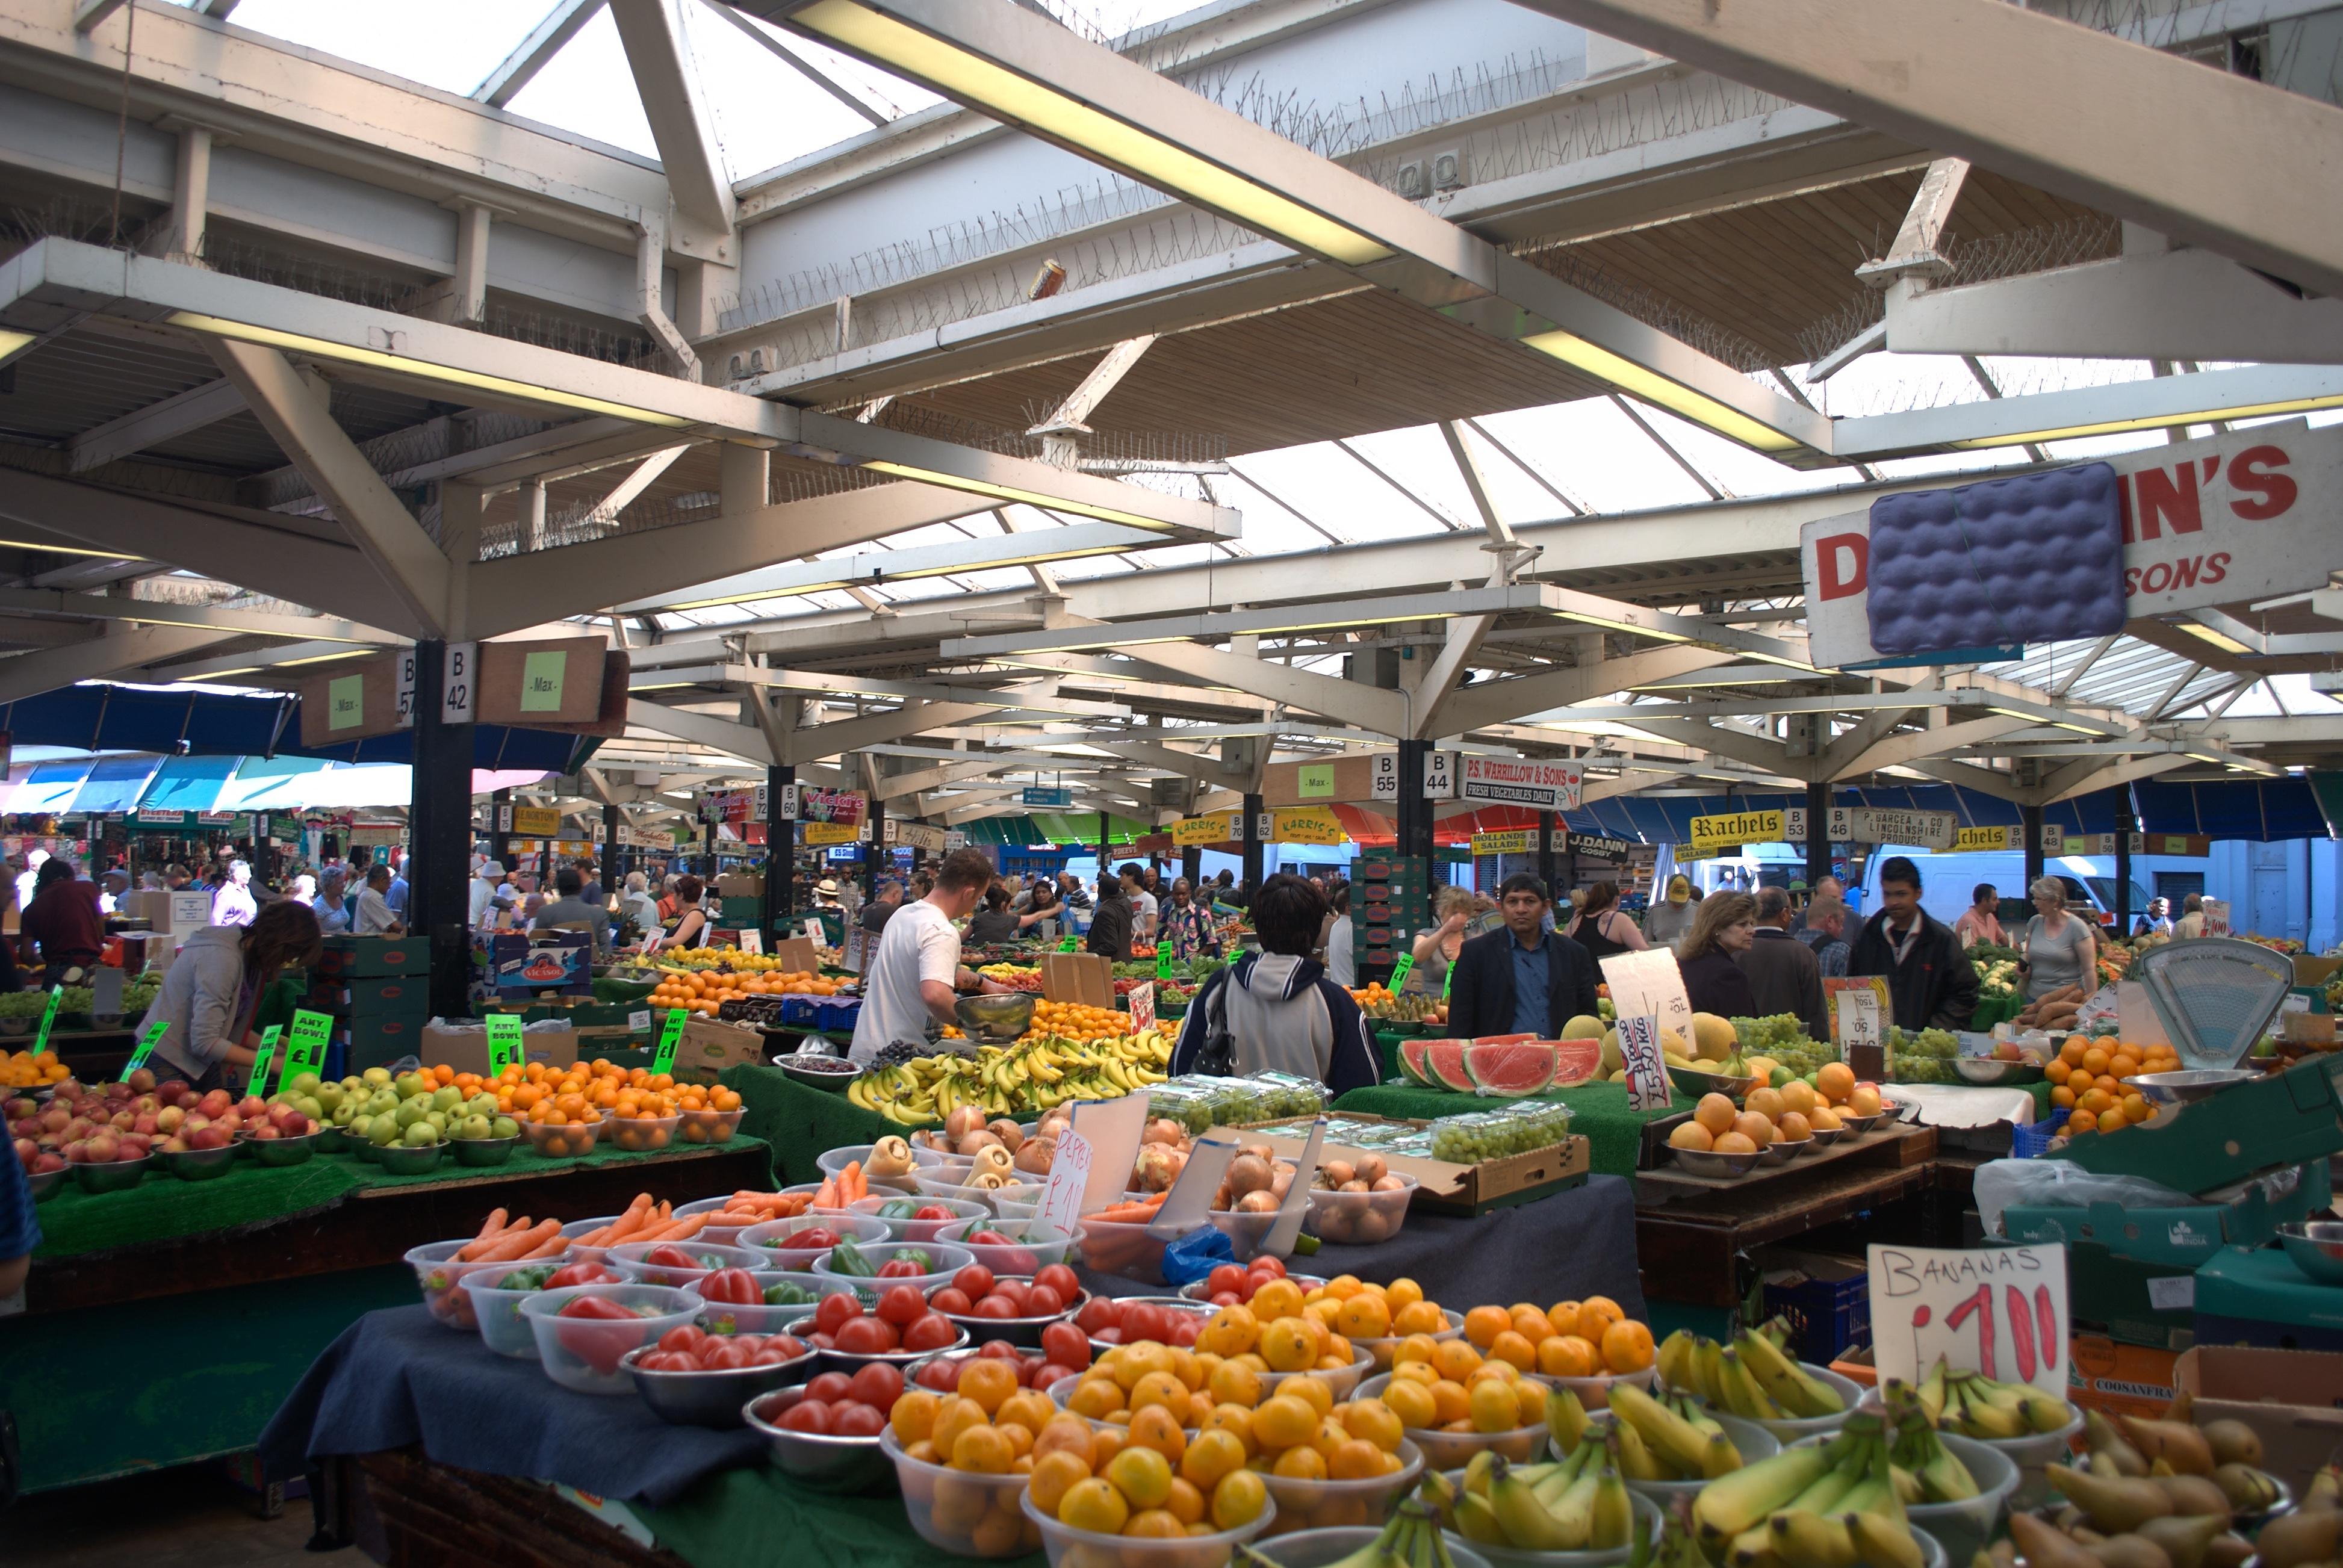 Leicester_Market_2010.jpg